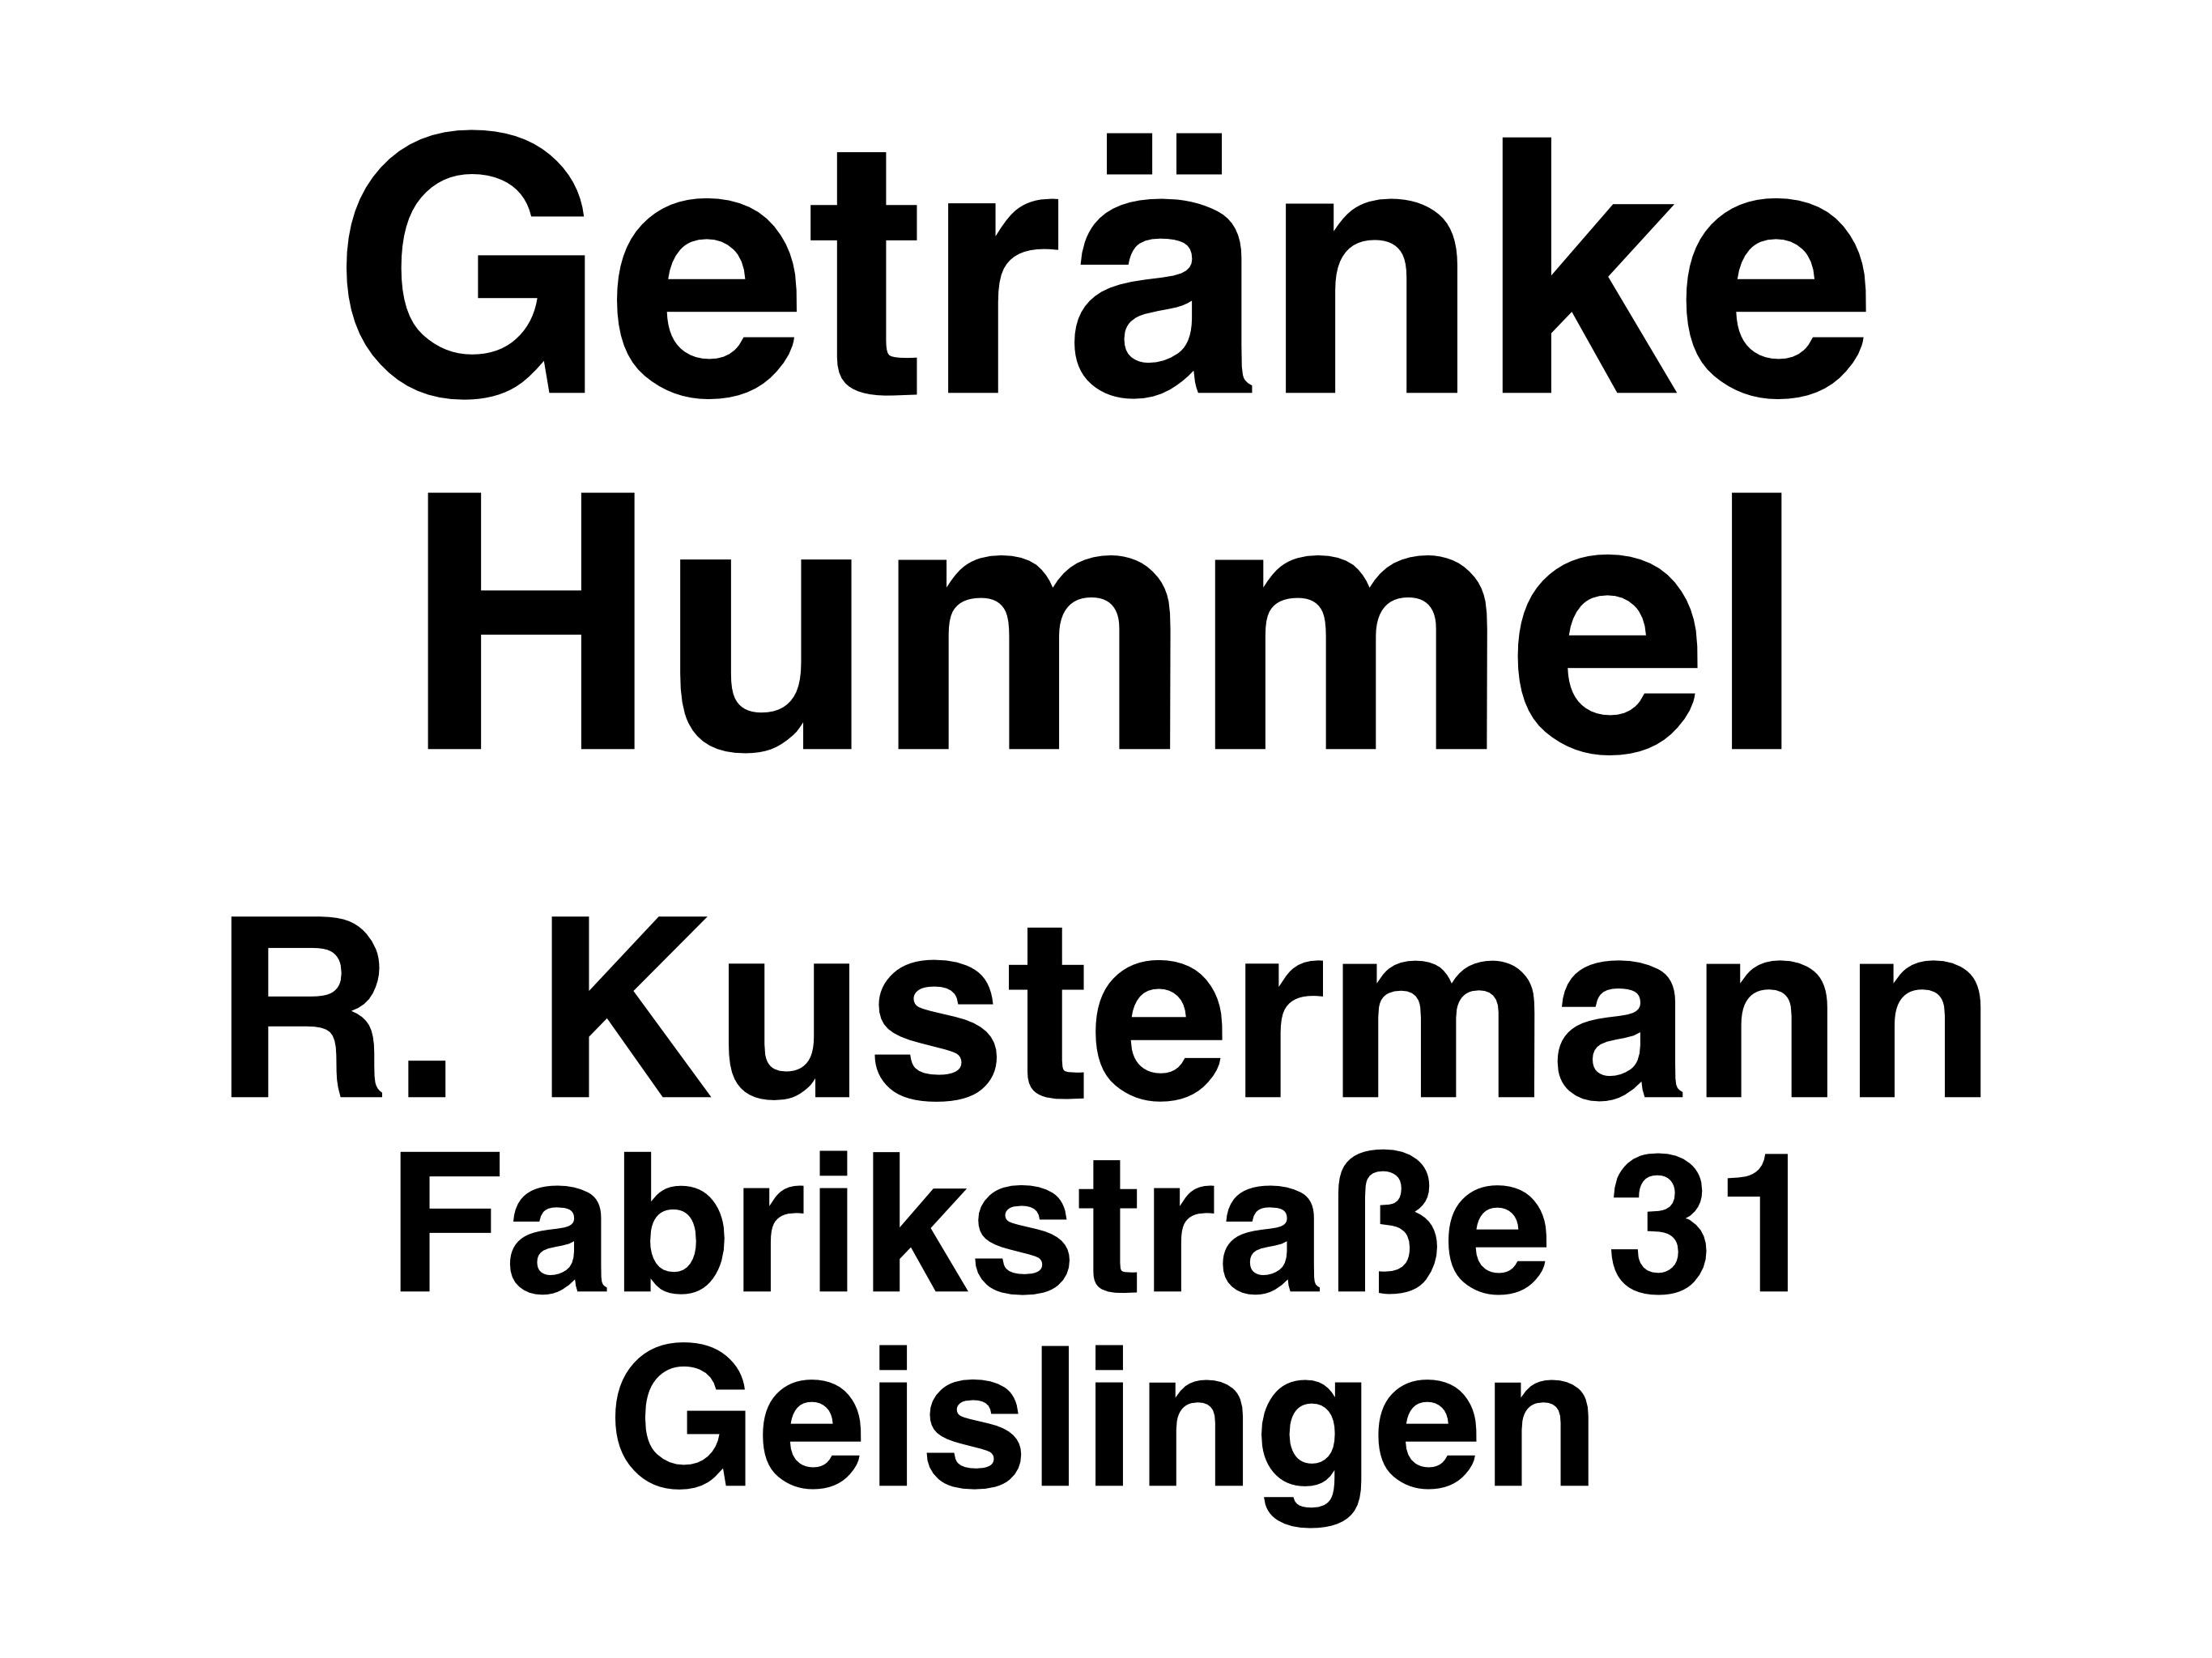 Getränke Hummel // Geislingen Fabrikstraße 31